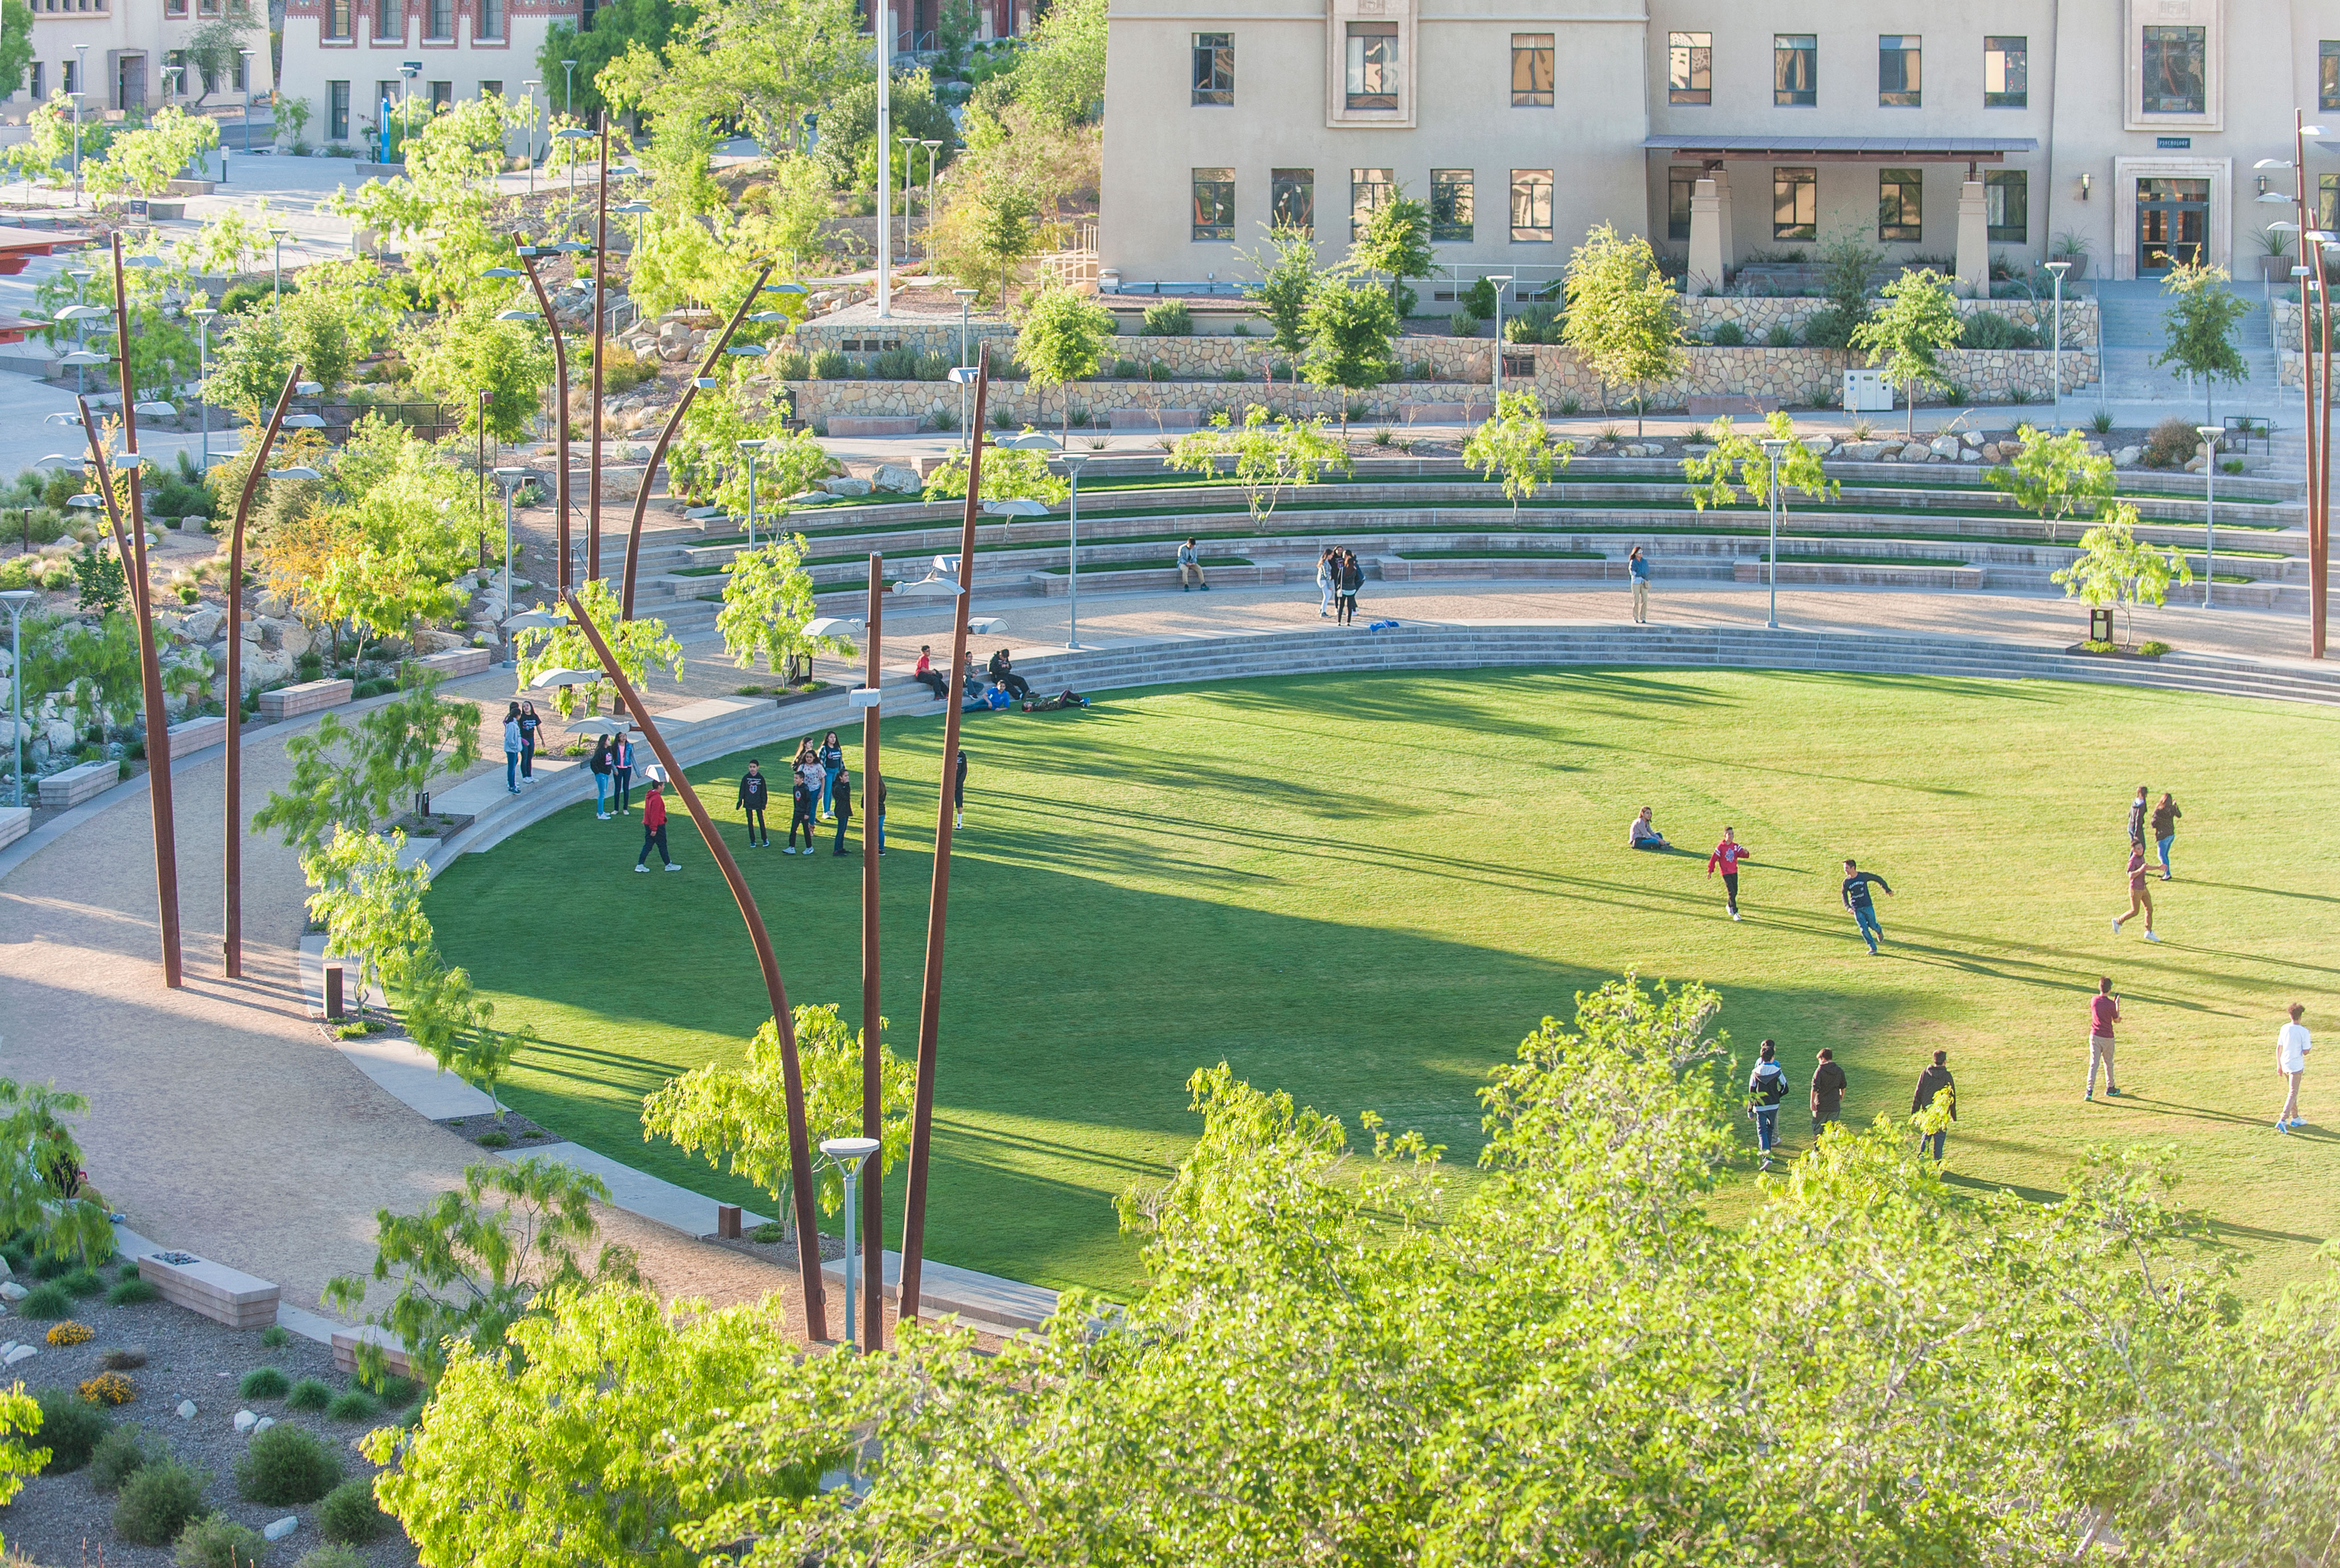 SITES project spotlight: The University of Texas at El Paso | SITES